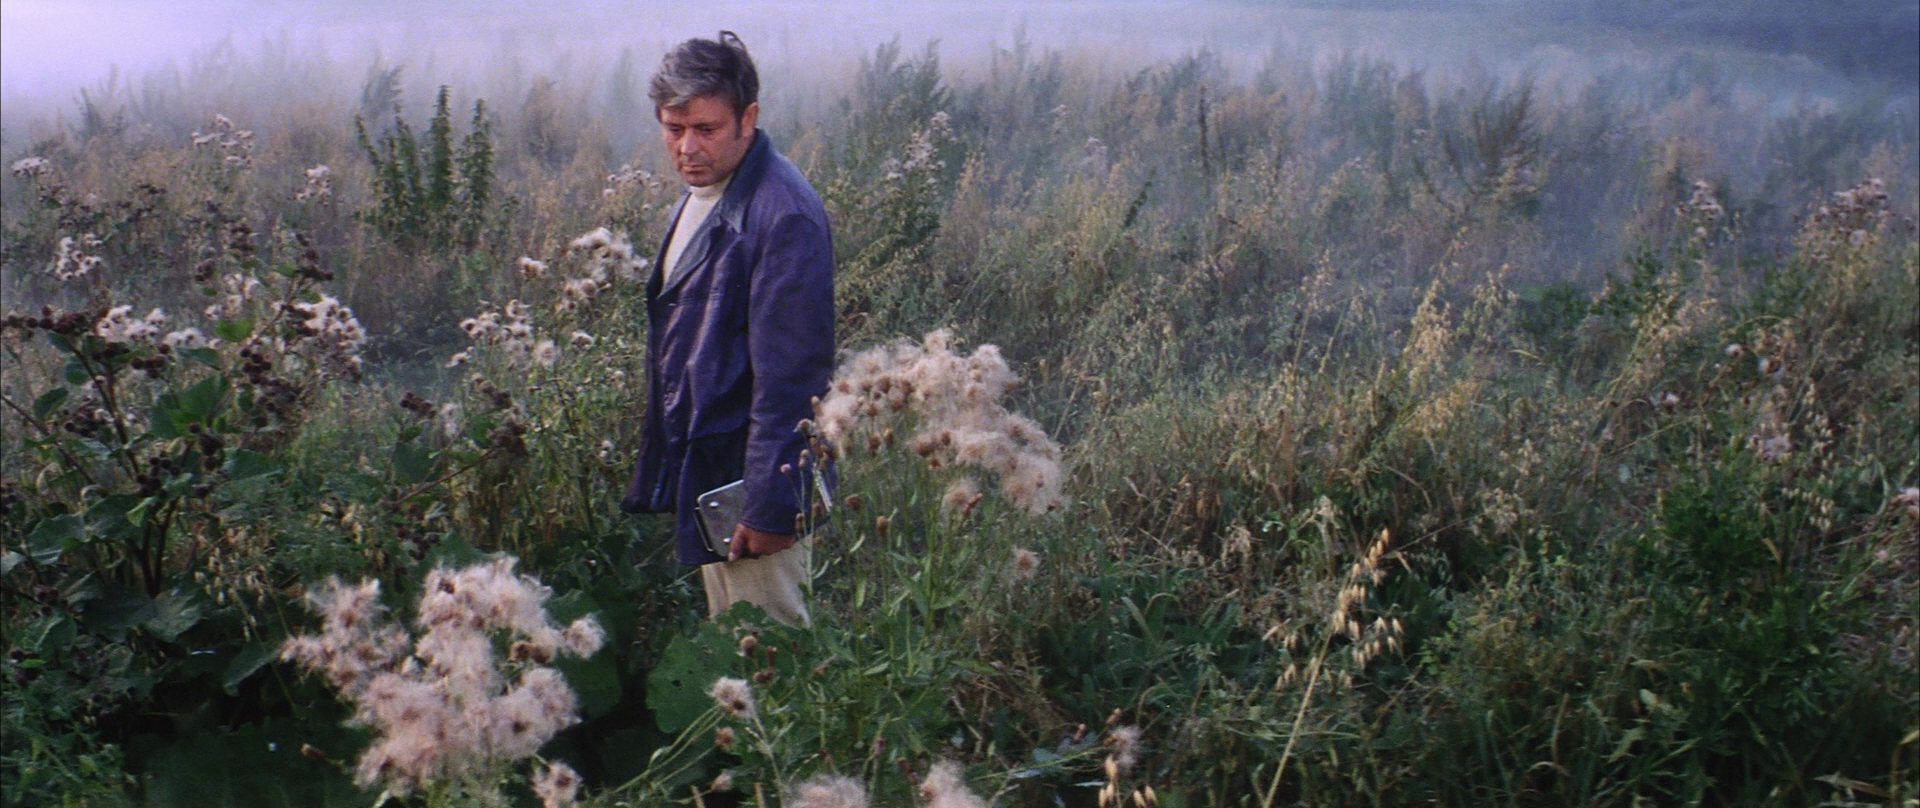 Solaris 1971 dir. Andrei Tarkovsky. Production Design Mikhail ...